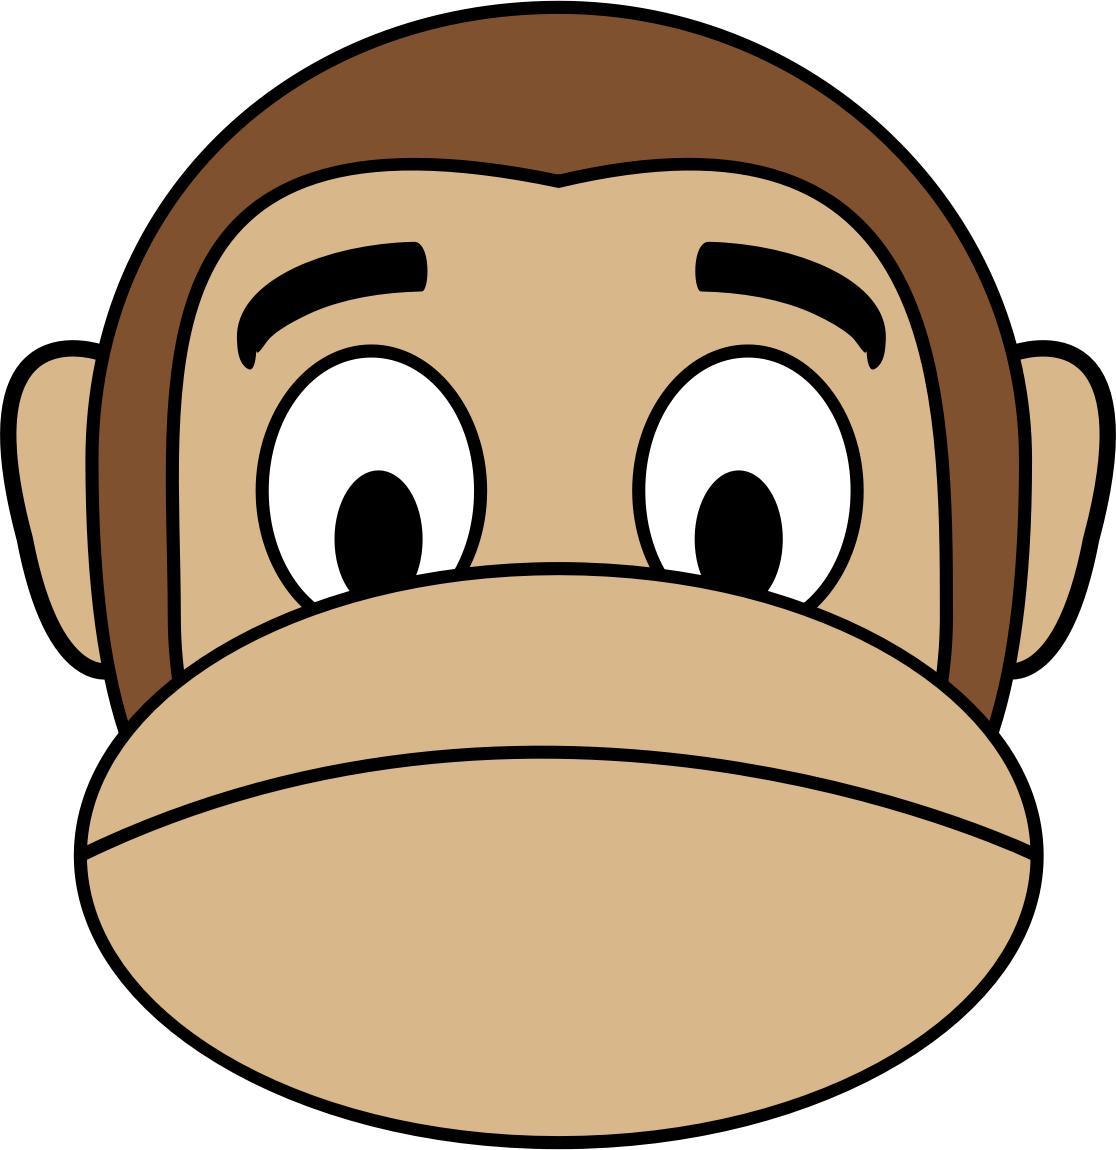 Ape clipart sad. Free monkey icons png